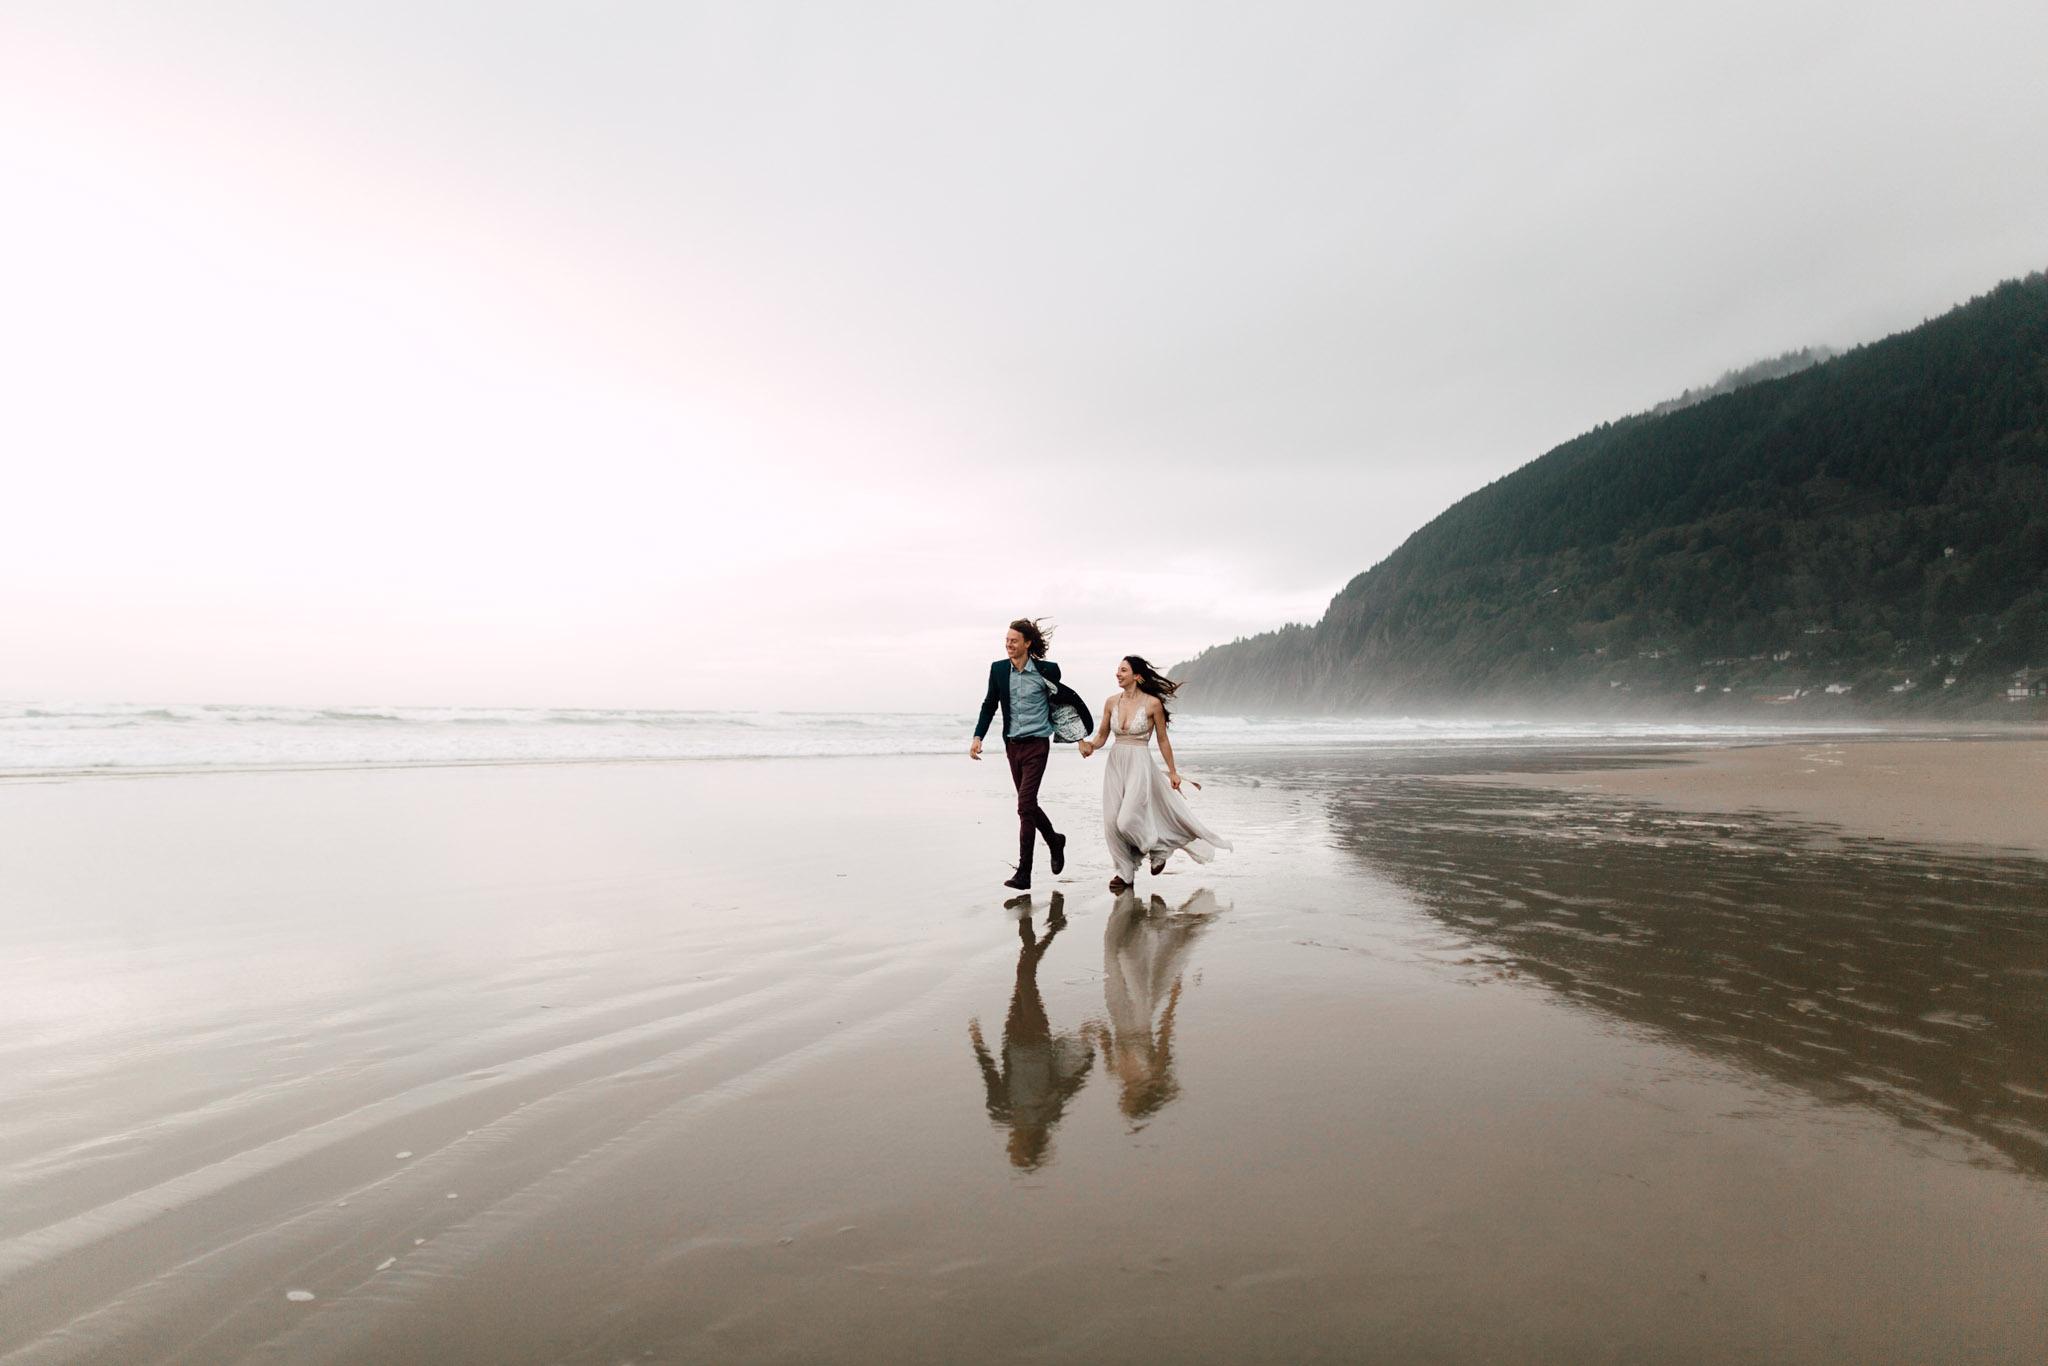 Oregon-Coast-Manzanita-Beach-Engagement-Pia-Anna-Christian-Wedding-Photography-PNW-GB-25.jpg